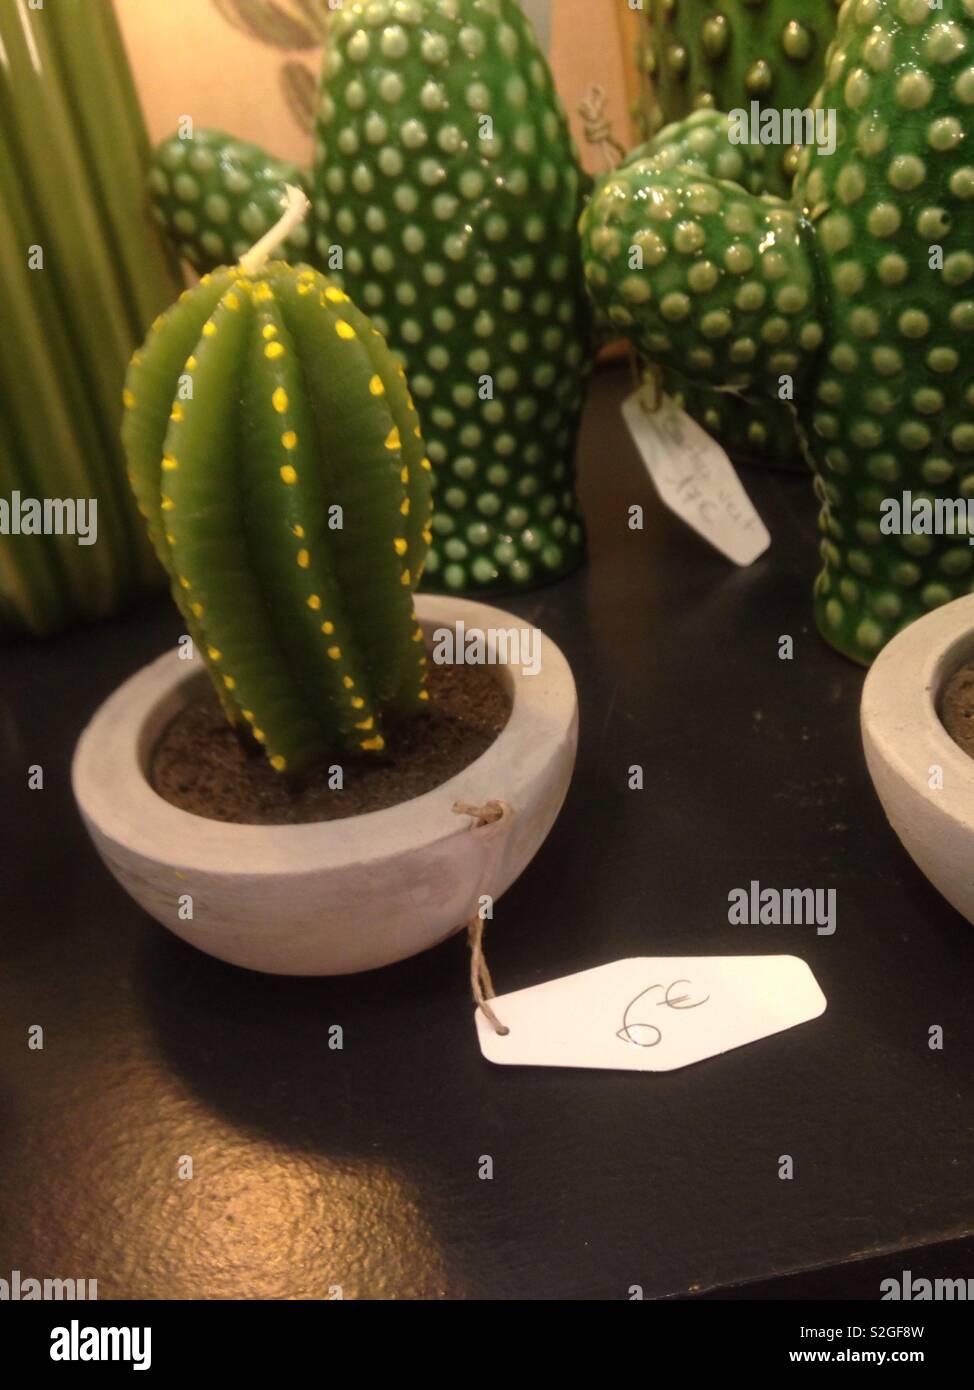 🌵 cactus - Stock Image